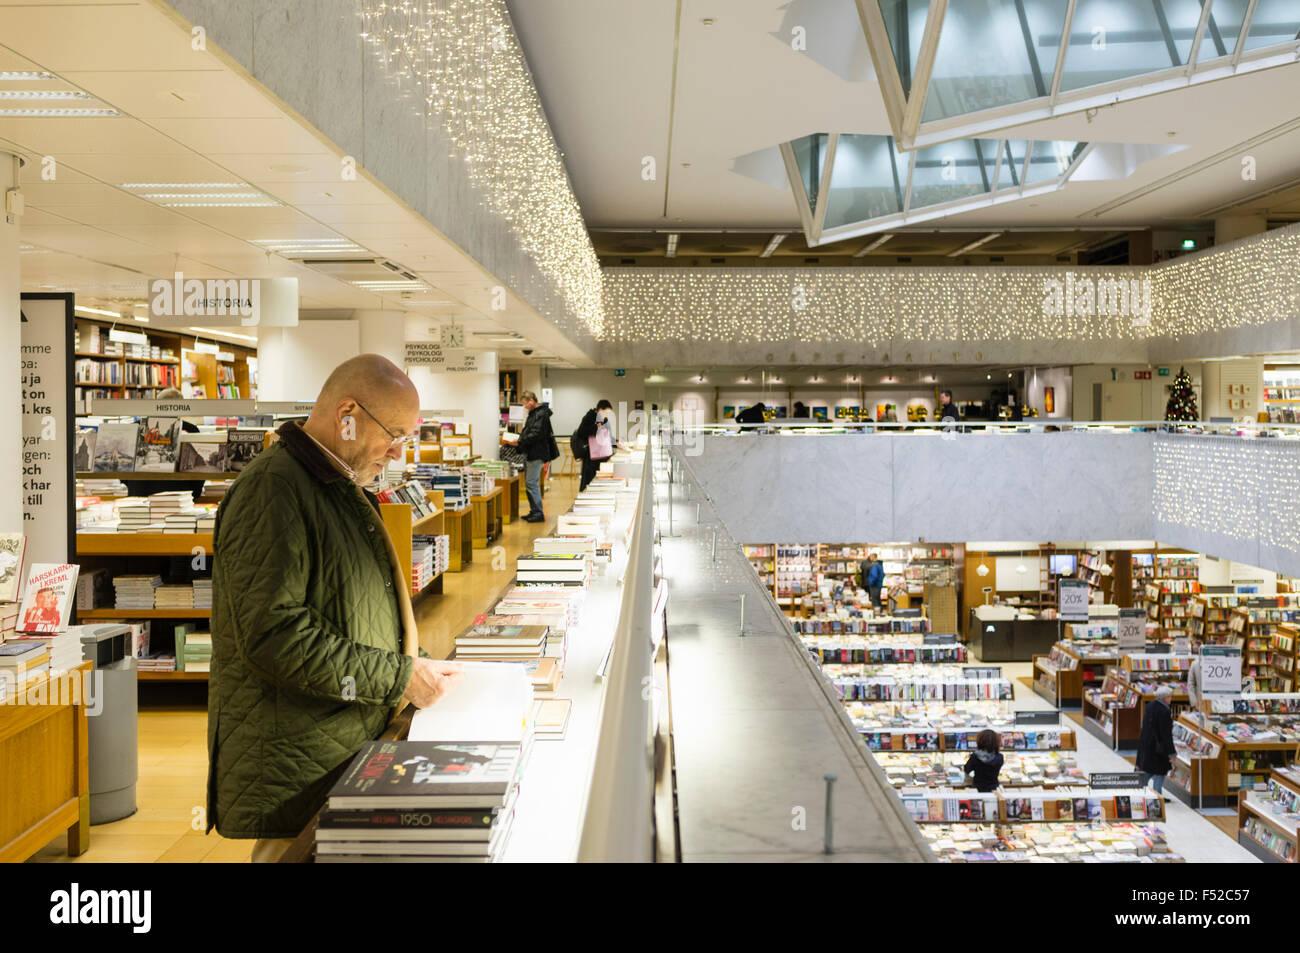 Academic bookstore 1966 - 1969 designed by Alvar Aalto. Centralgatan, 1, Helsinki, Finland - Stock Image